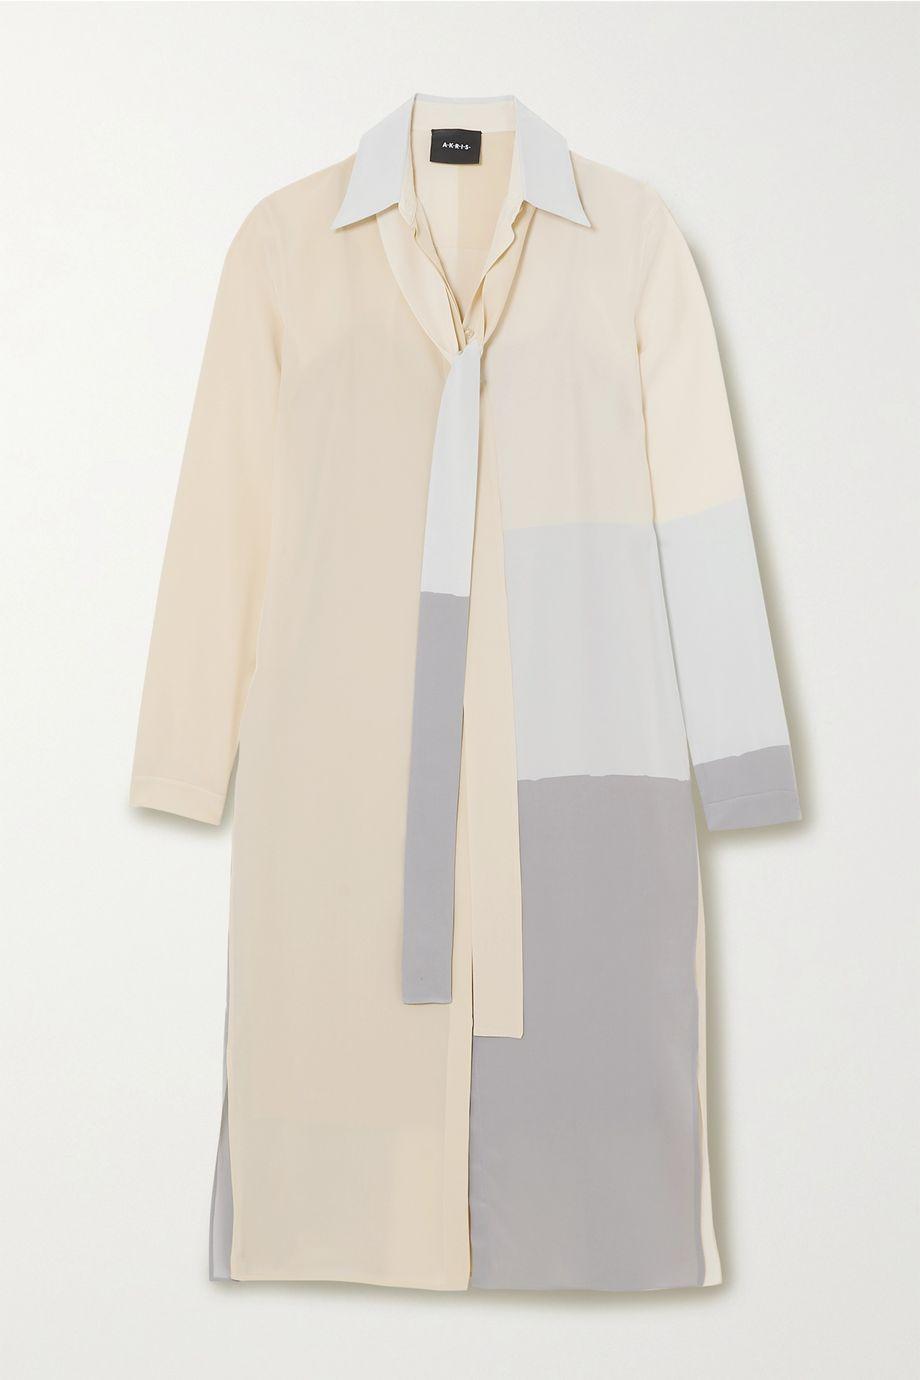 Akris Color-block mulberry silk crepe de chine tunic